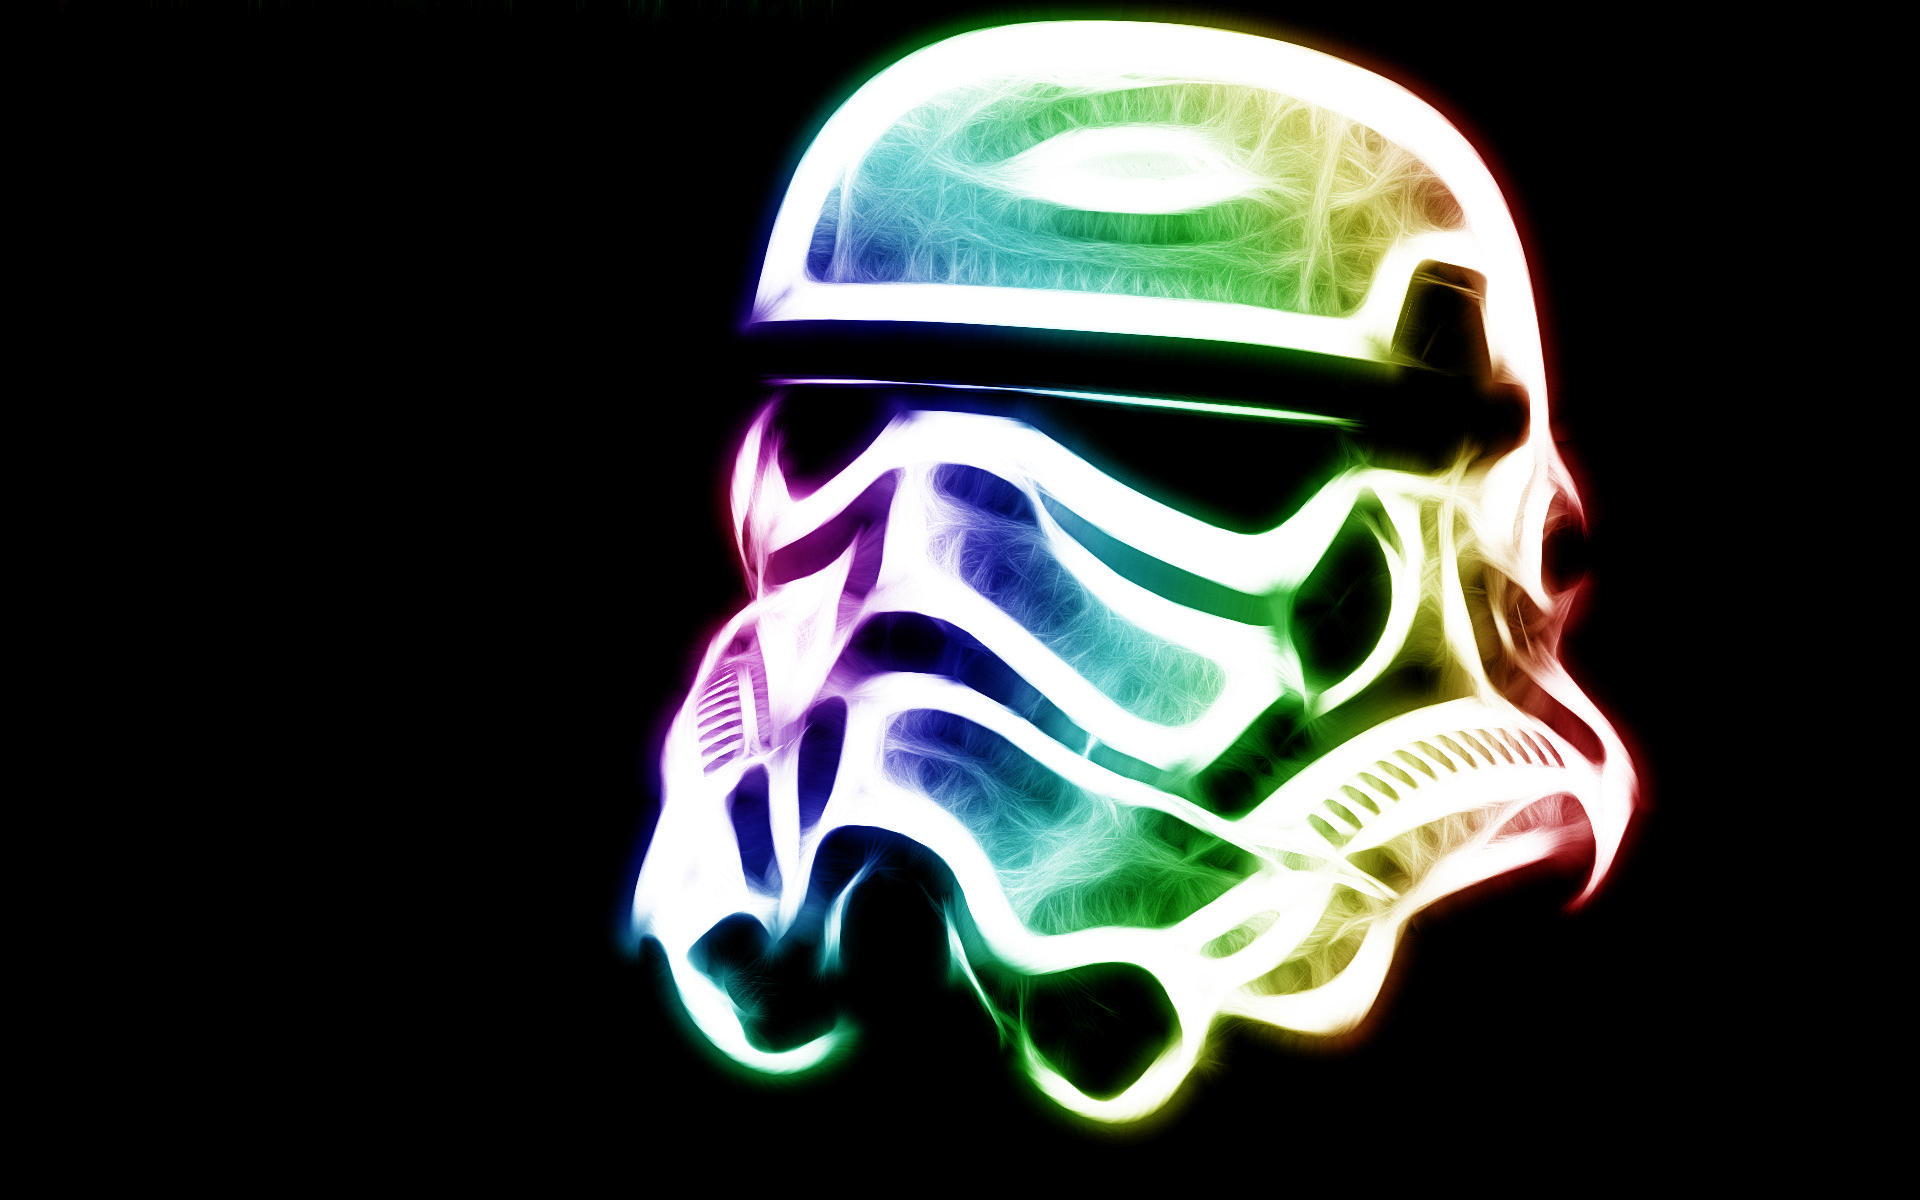 Resolution Star Wars Stormtrooper Wallpaper 13   SiWallpaperHD 6046 1920x1200